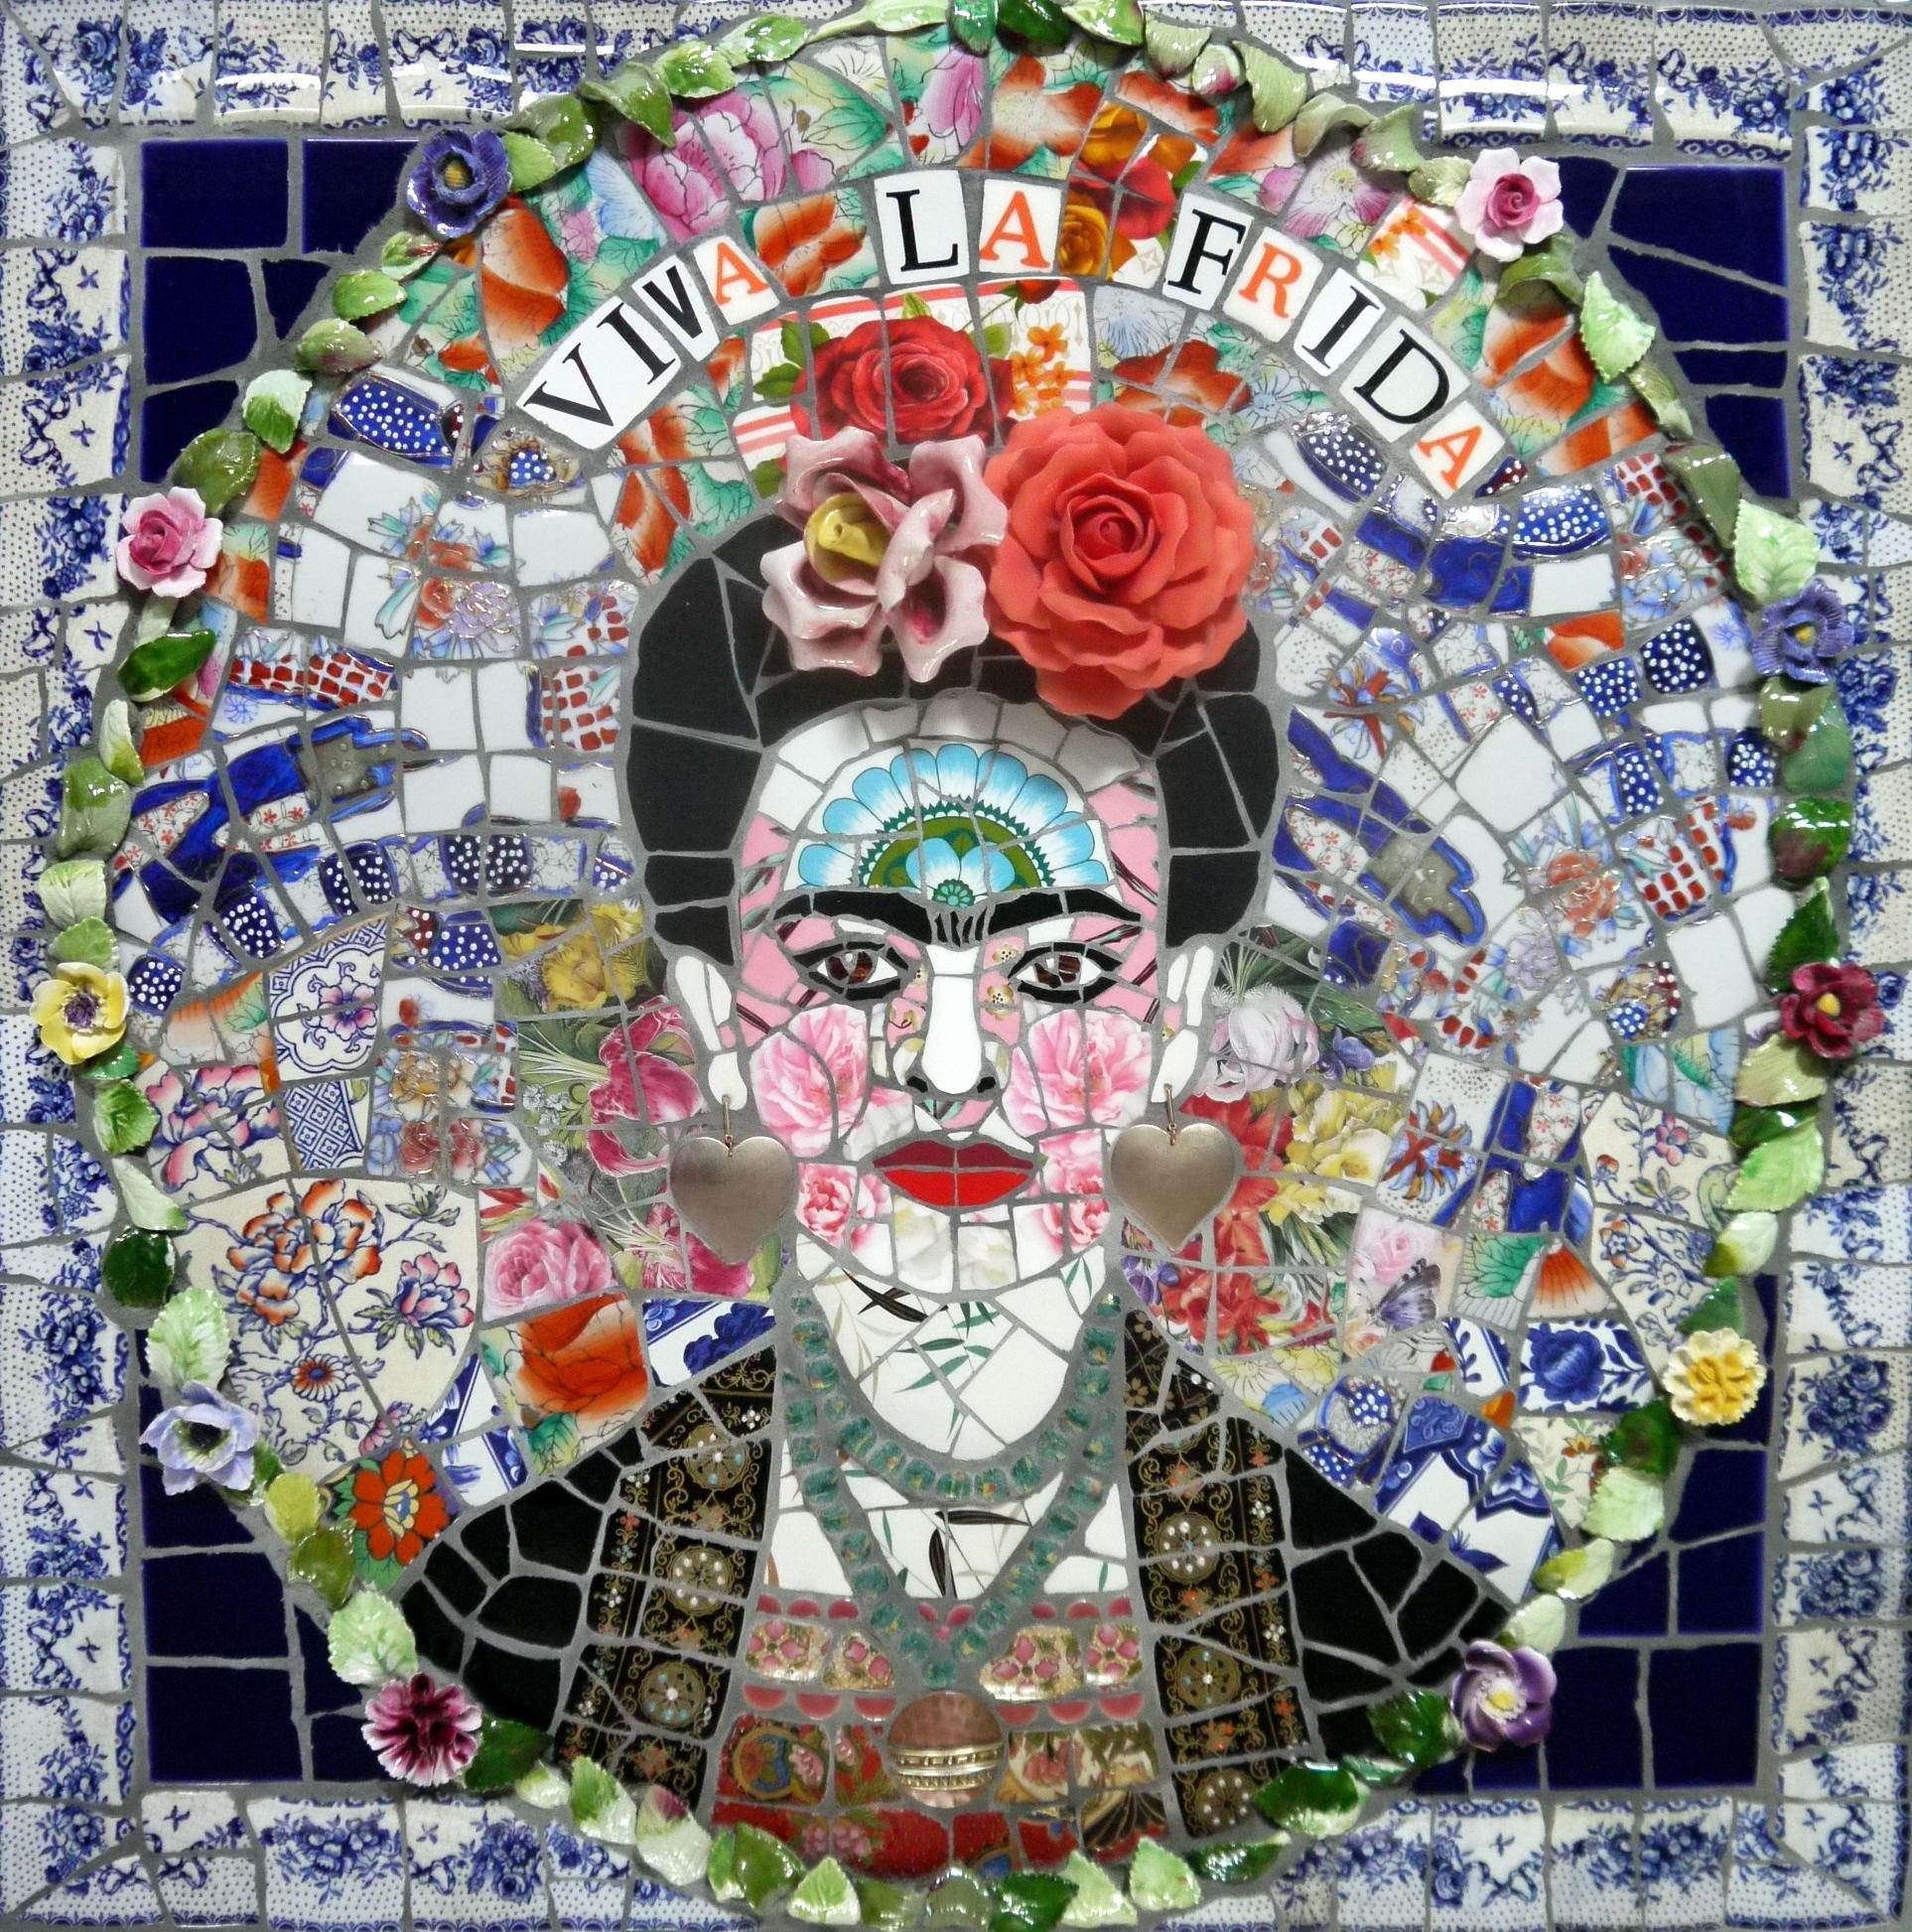 Viva La Frida , Recycled ceramic mosaic by English Artist Susan Elliott